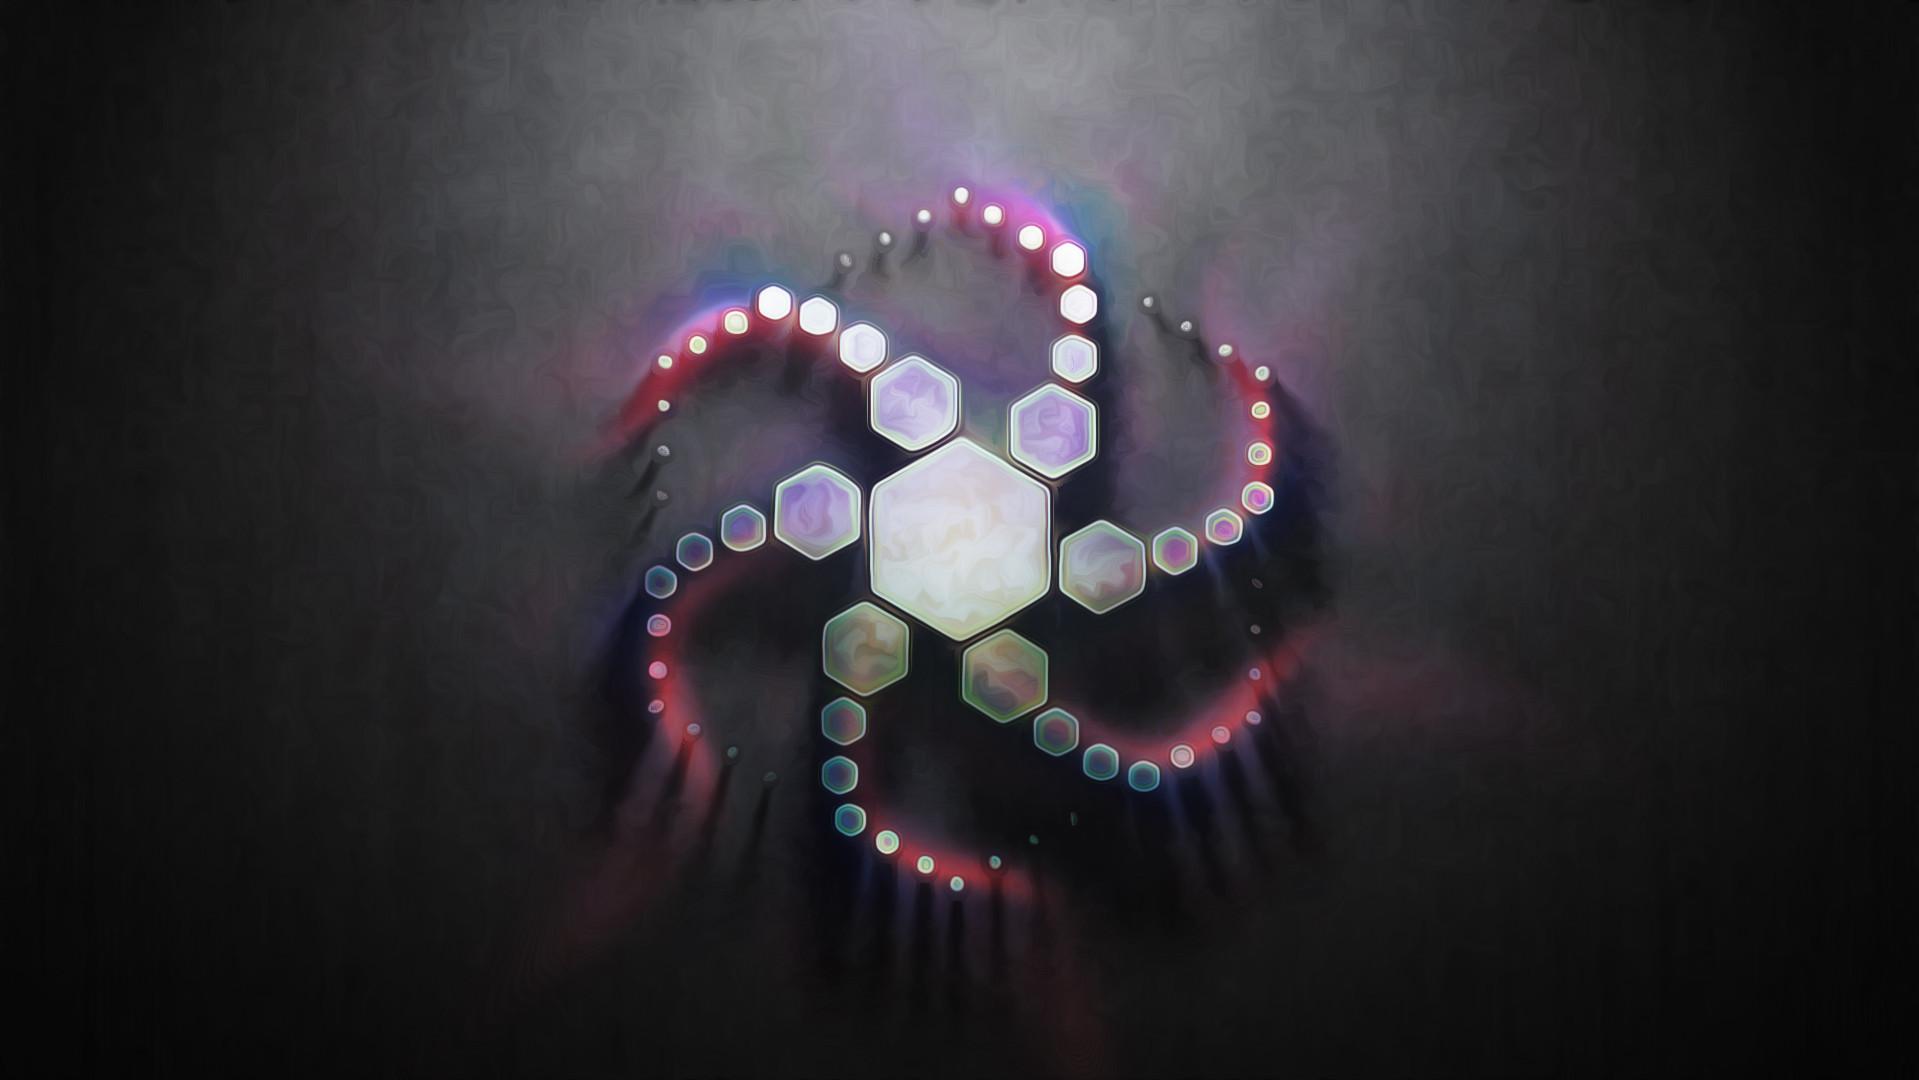 Cephalon-Suda-Purple-%C3%97-Warframe-Syndicate-wallpaper-wp5205085